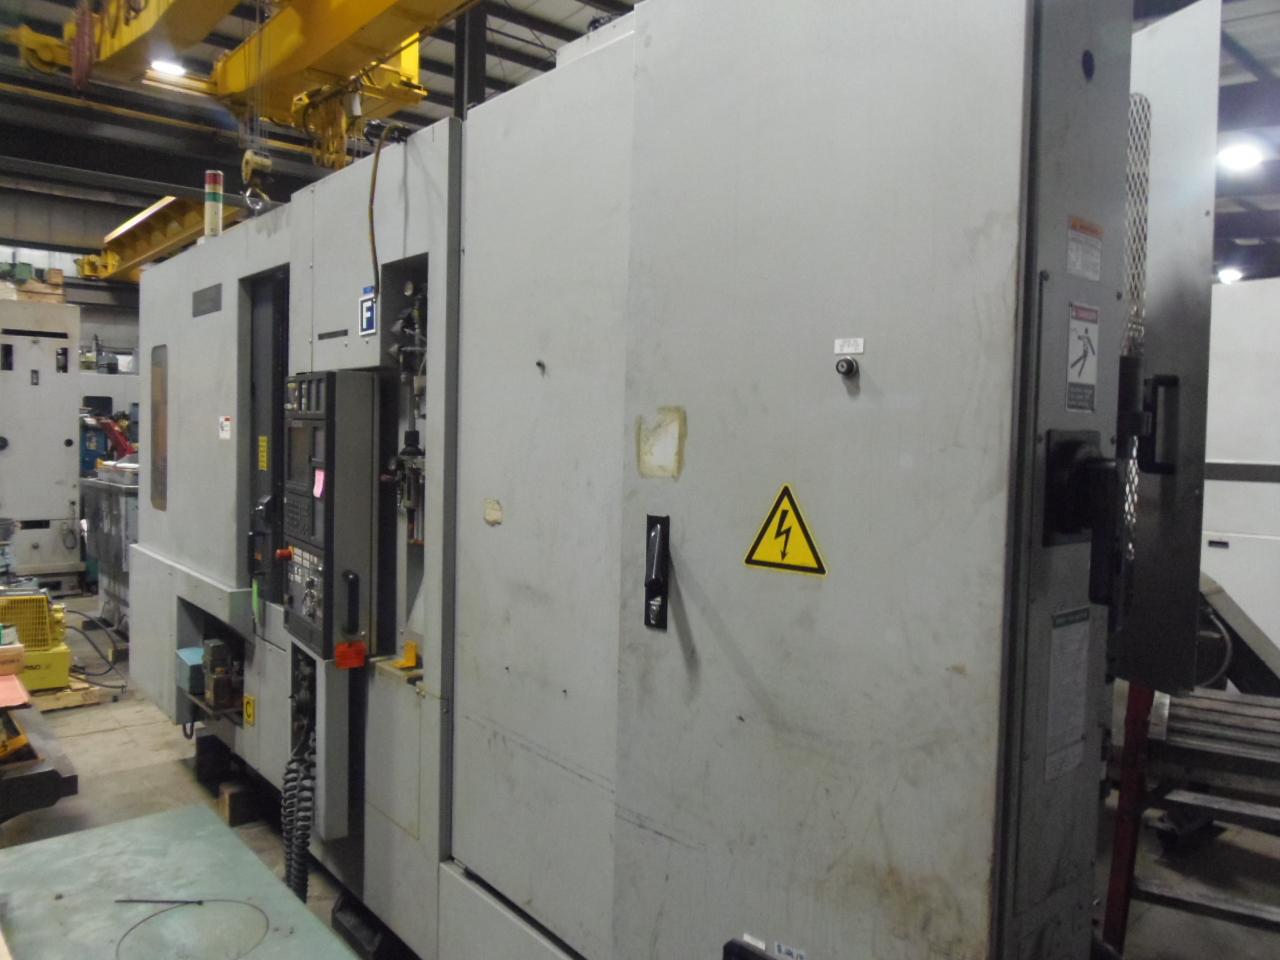 NH-5000/40 MORI SEIKI HORIZONTAL MACHINING CENTER, MODEL NH5000, 2003, THRU SPINDLE COOLANT, 1 DEGREE, MSC501 WITH MAPPS, 60 ATC, 40 TAPER, 2 PALLET. 14,000 RPM